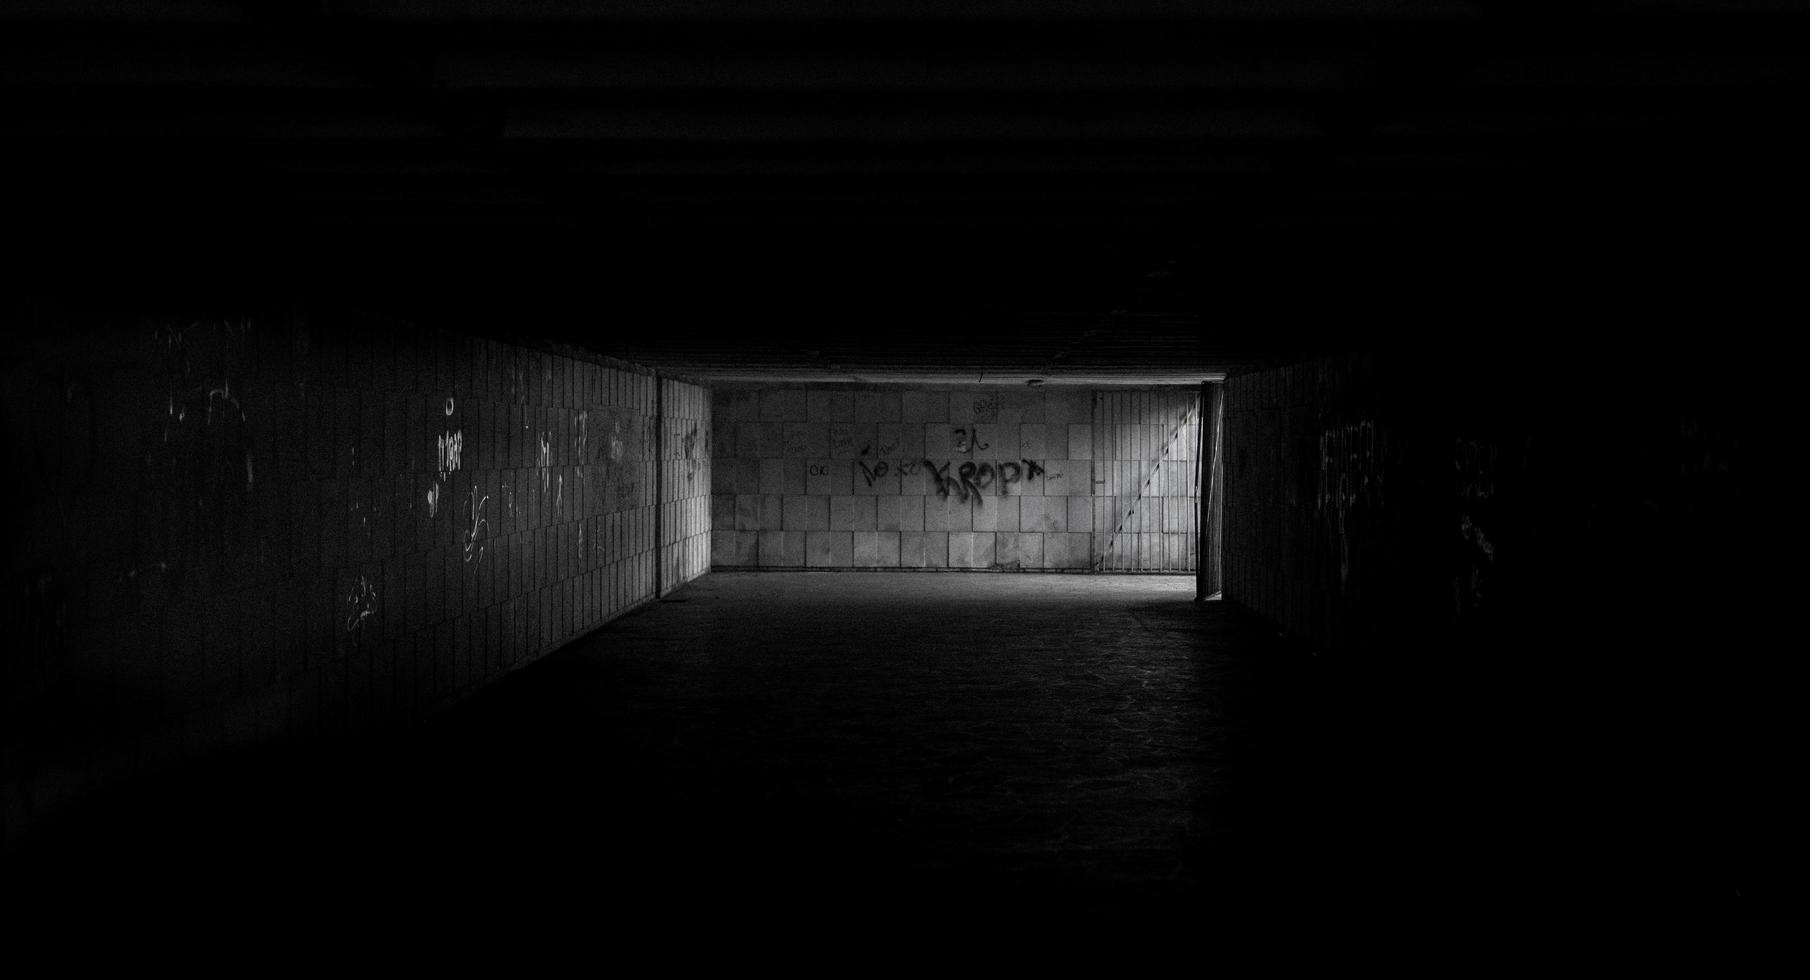 Fotografie des Graustufentunnels foto